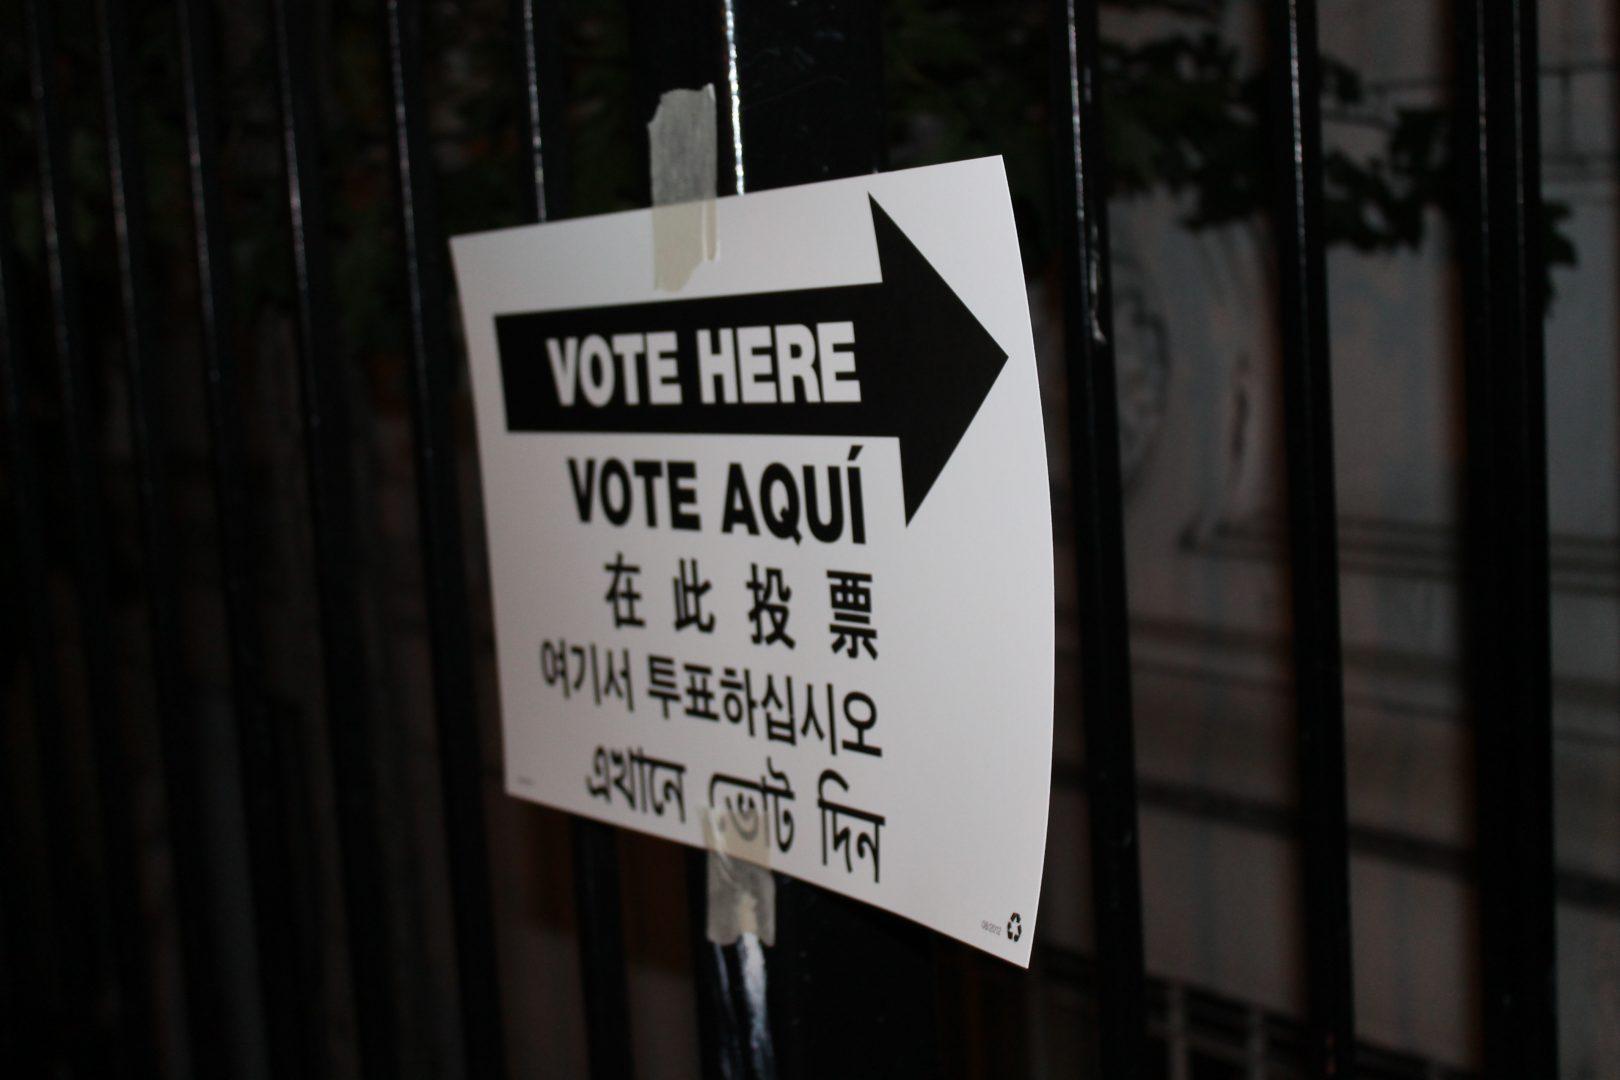 Most Promising Education Policies: Lhota or de Blasio?